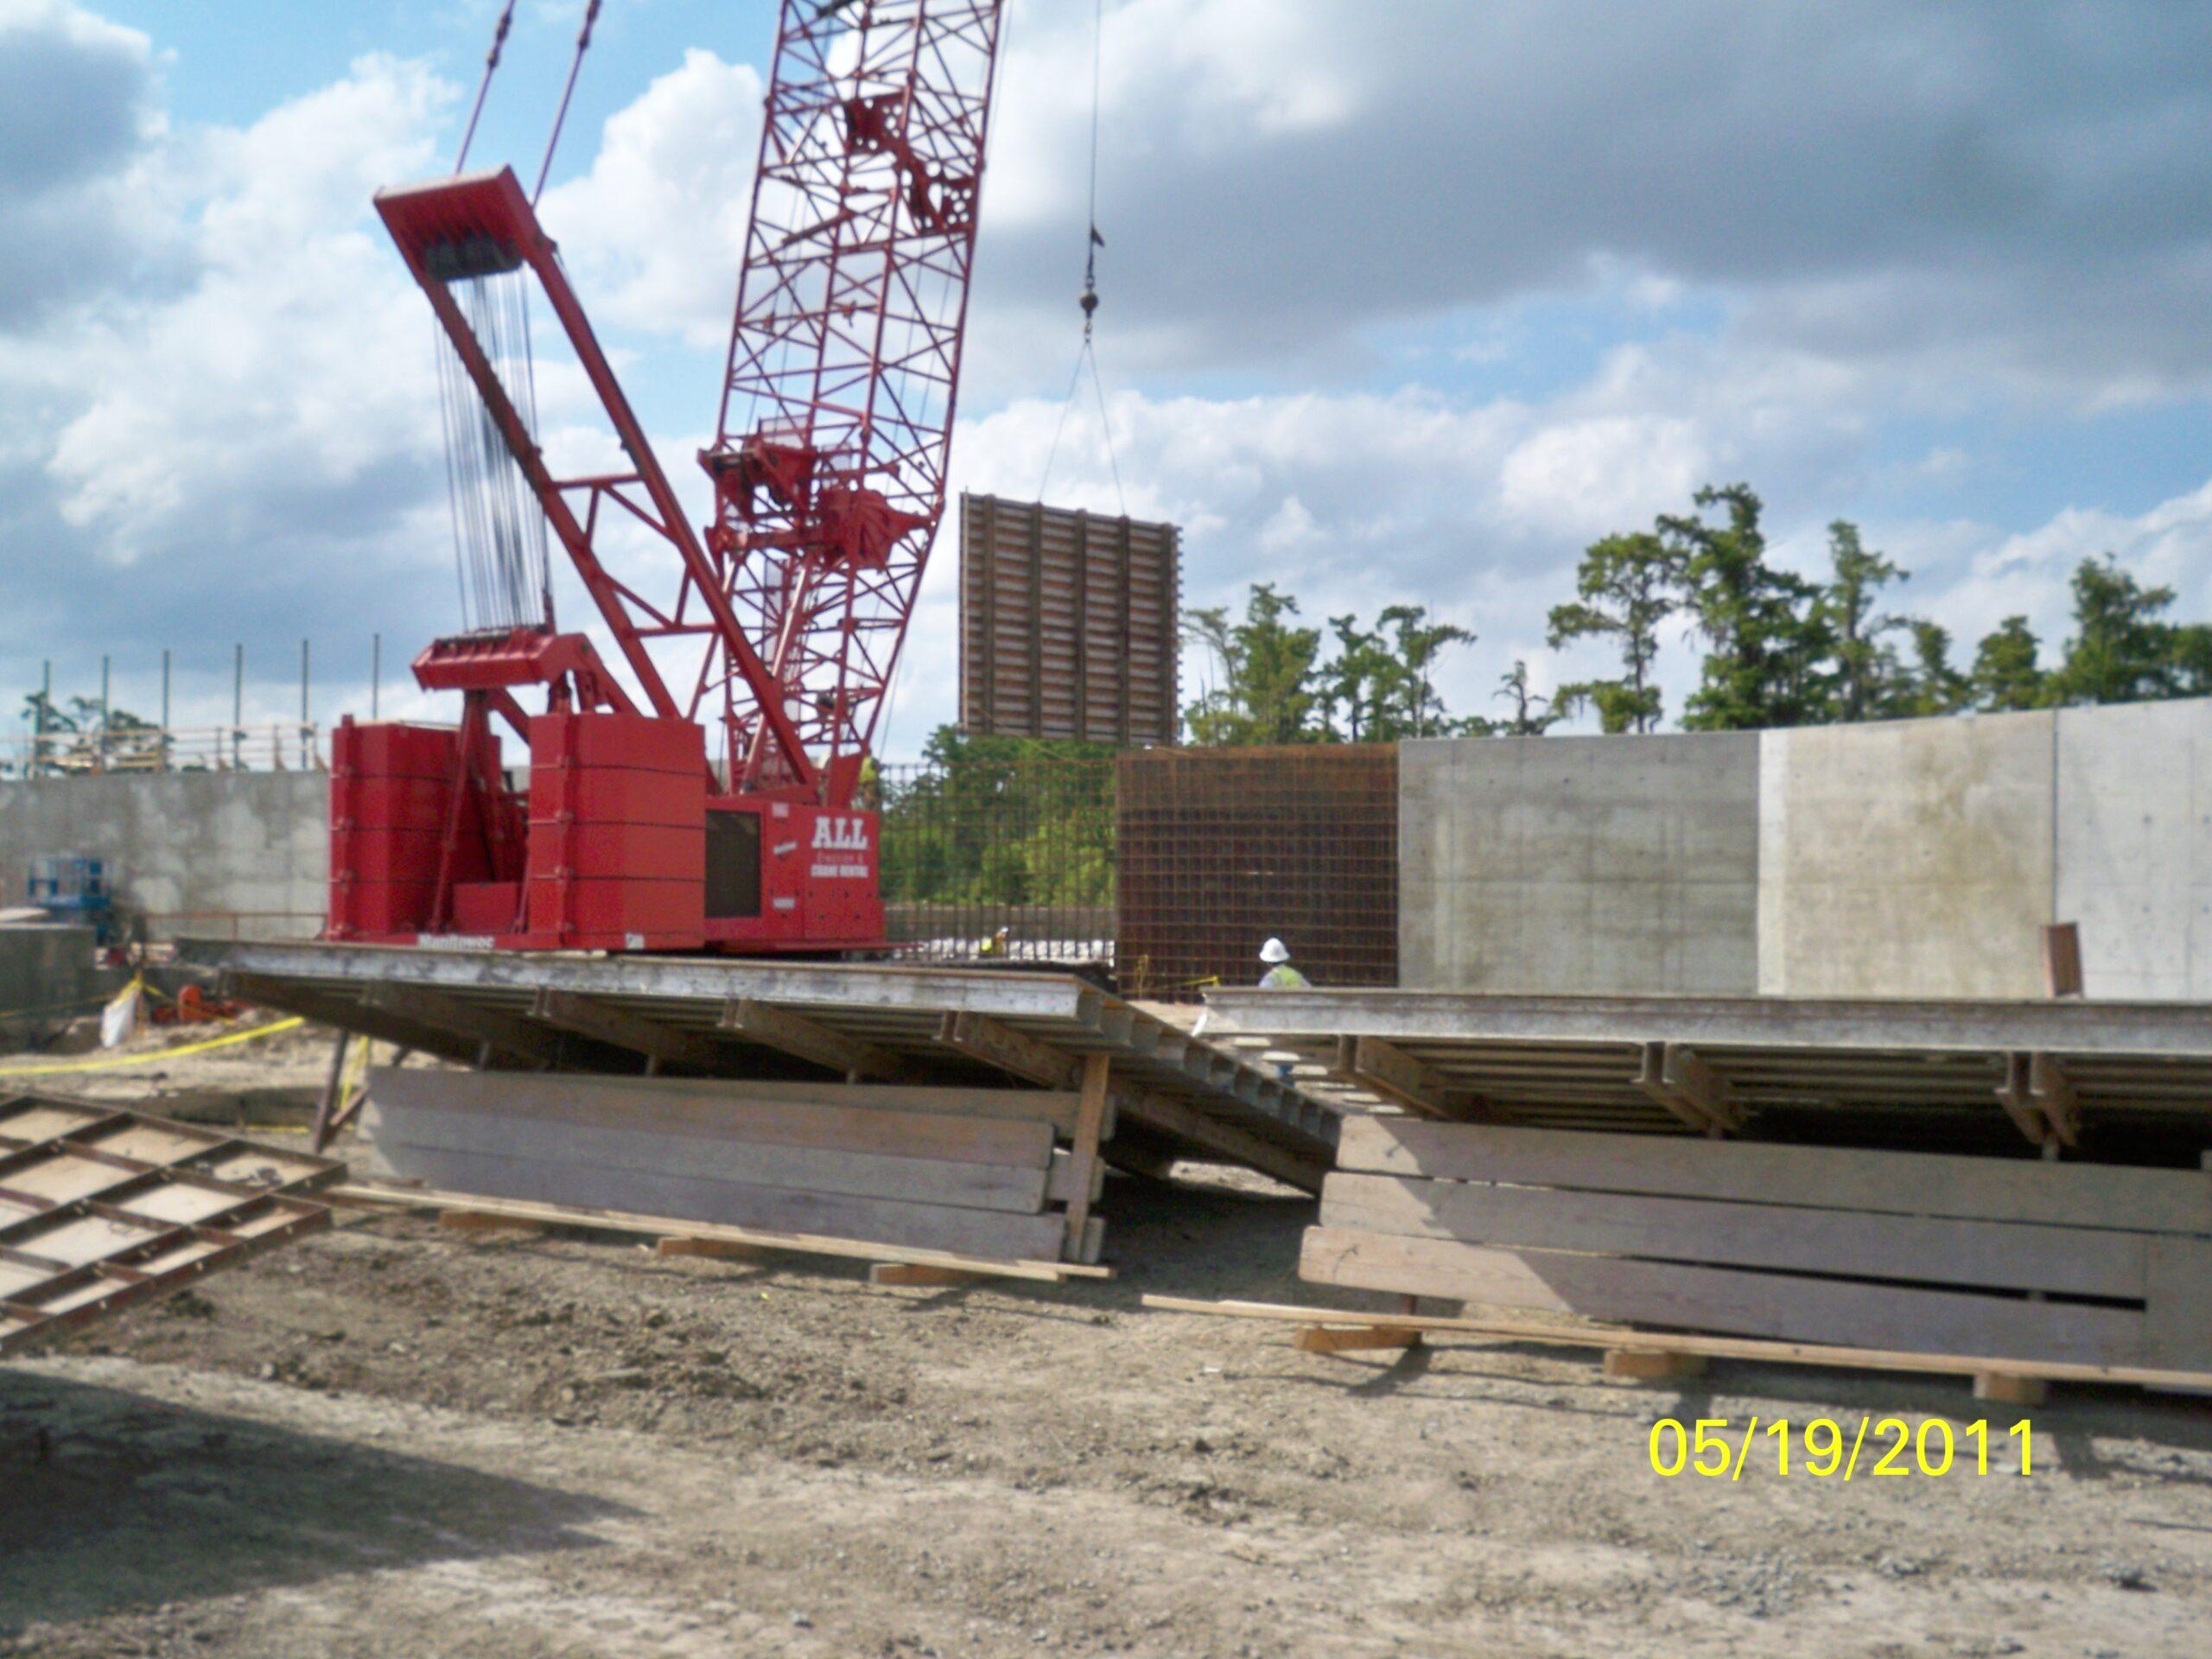 LPV07b.2 Cross Bayou Drainage Pump Station and Levee